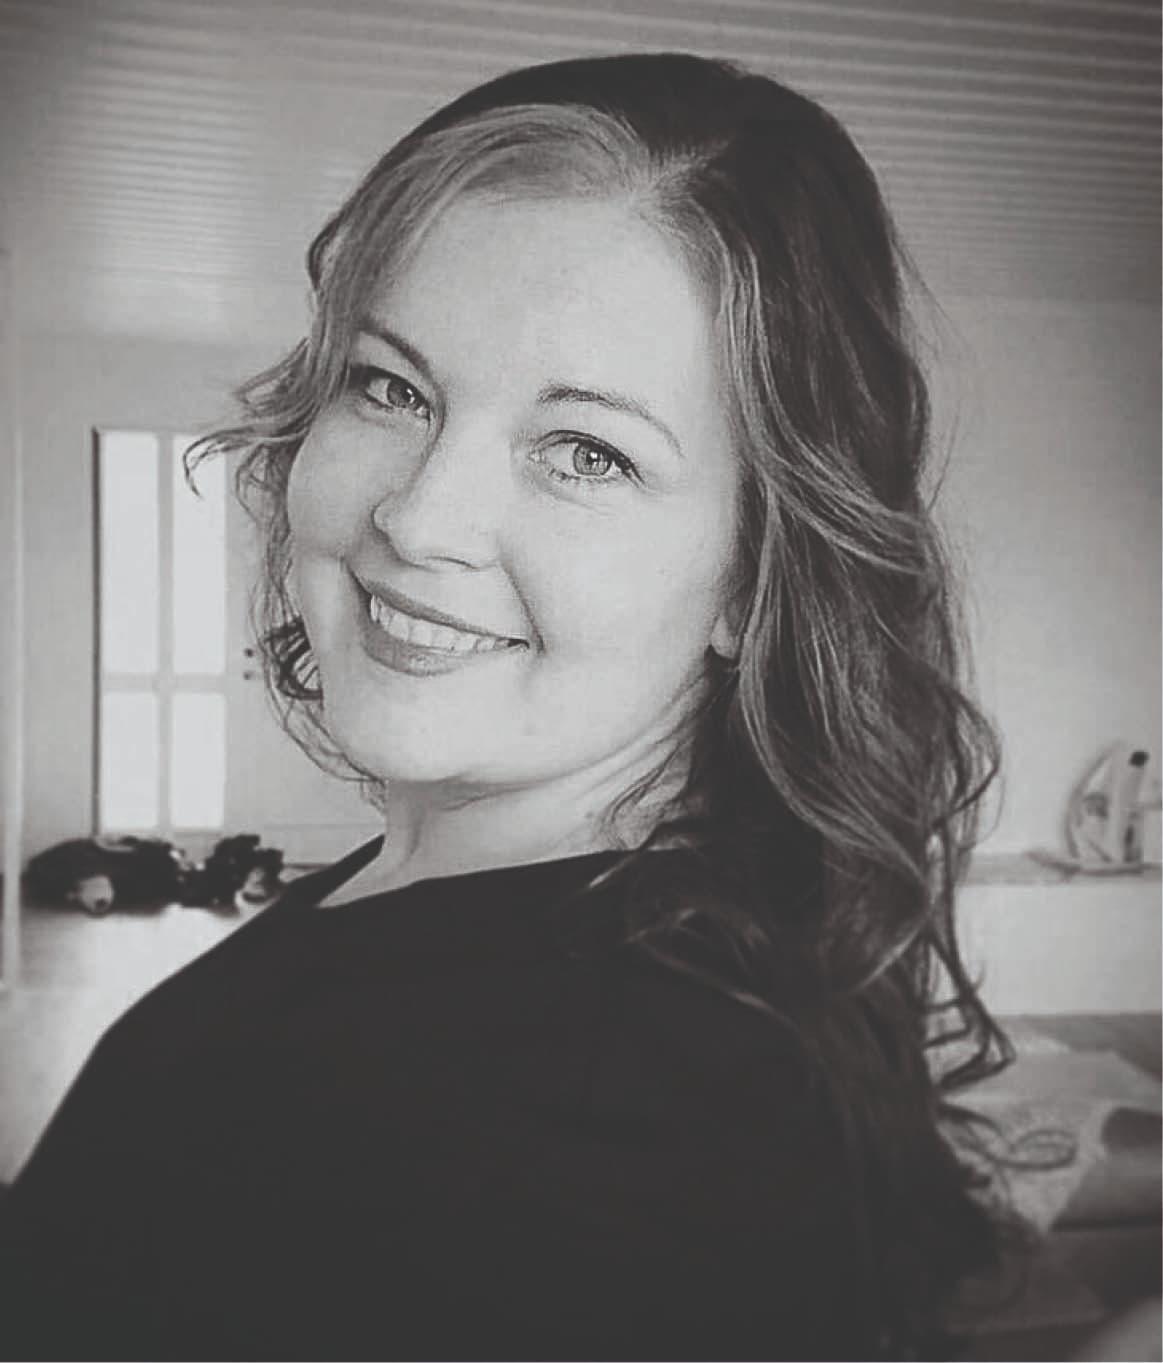 Marie-Astrid Löfdahl